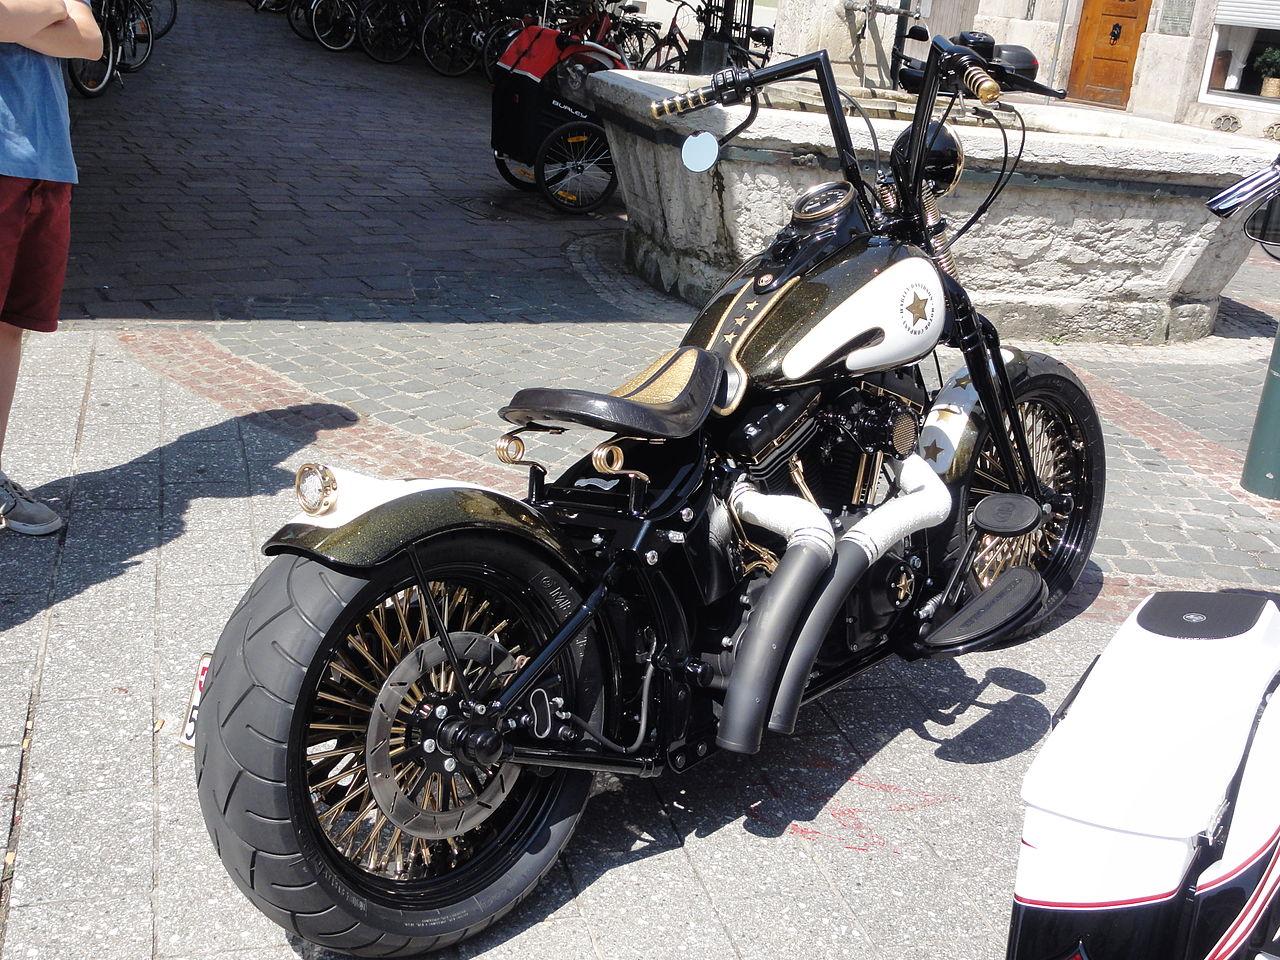 File:Lörrach - Harley custom made bikes (4) JPG - Wikimedia Commons